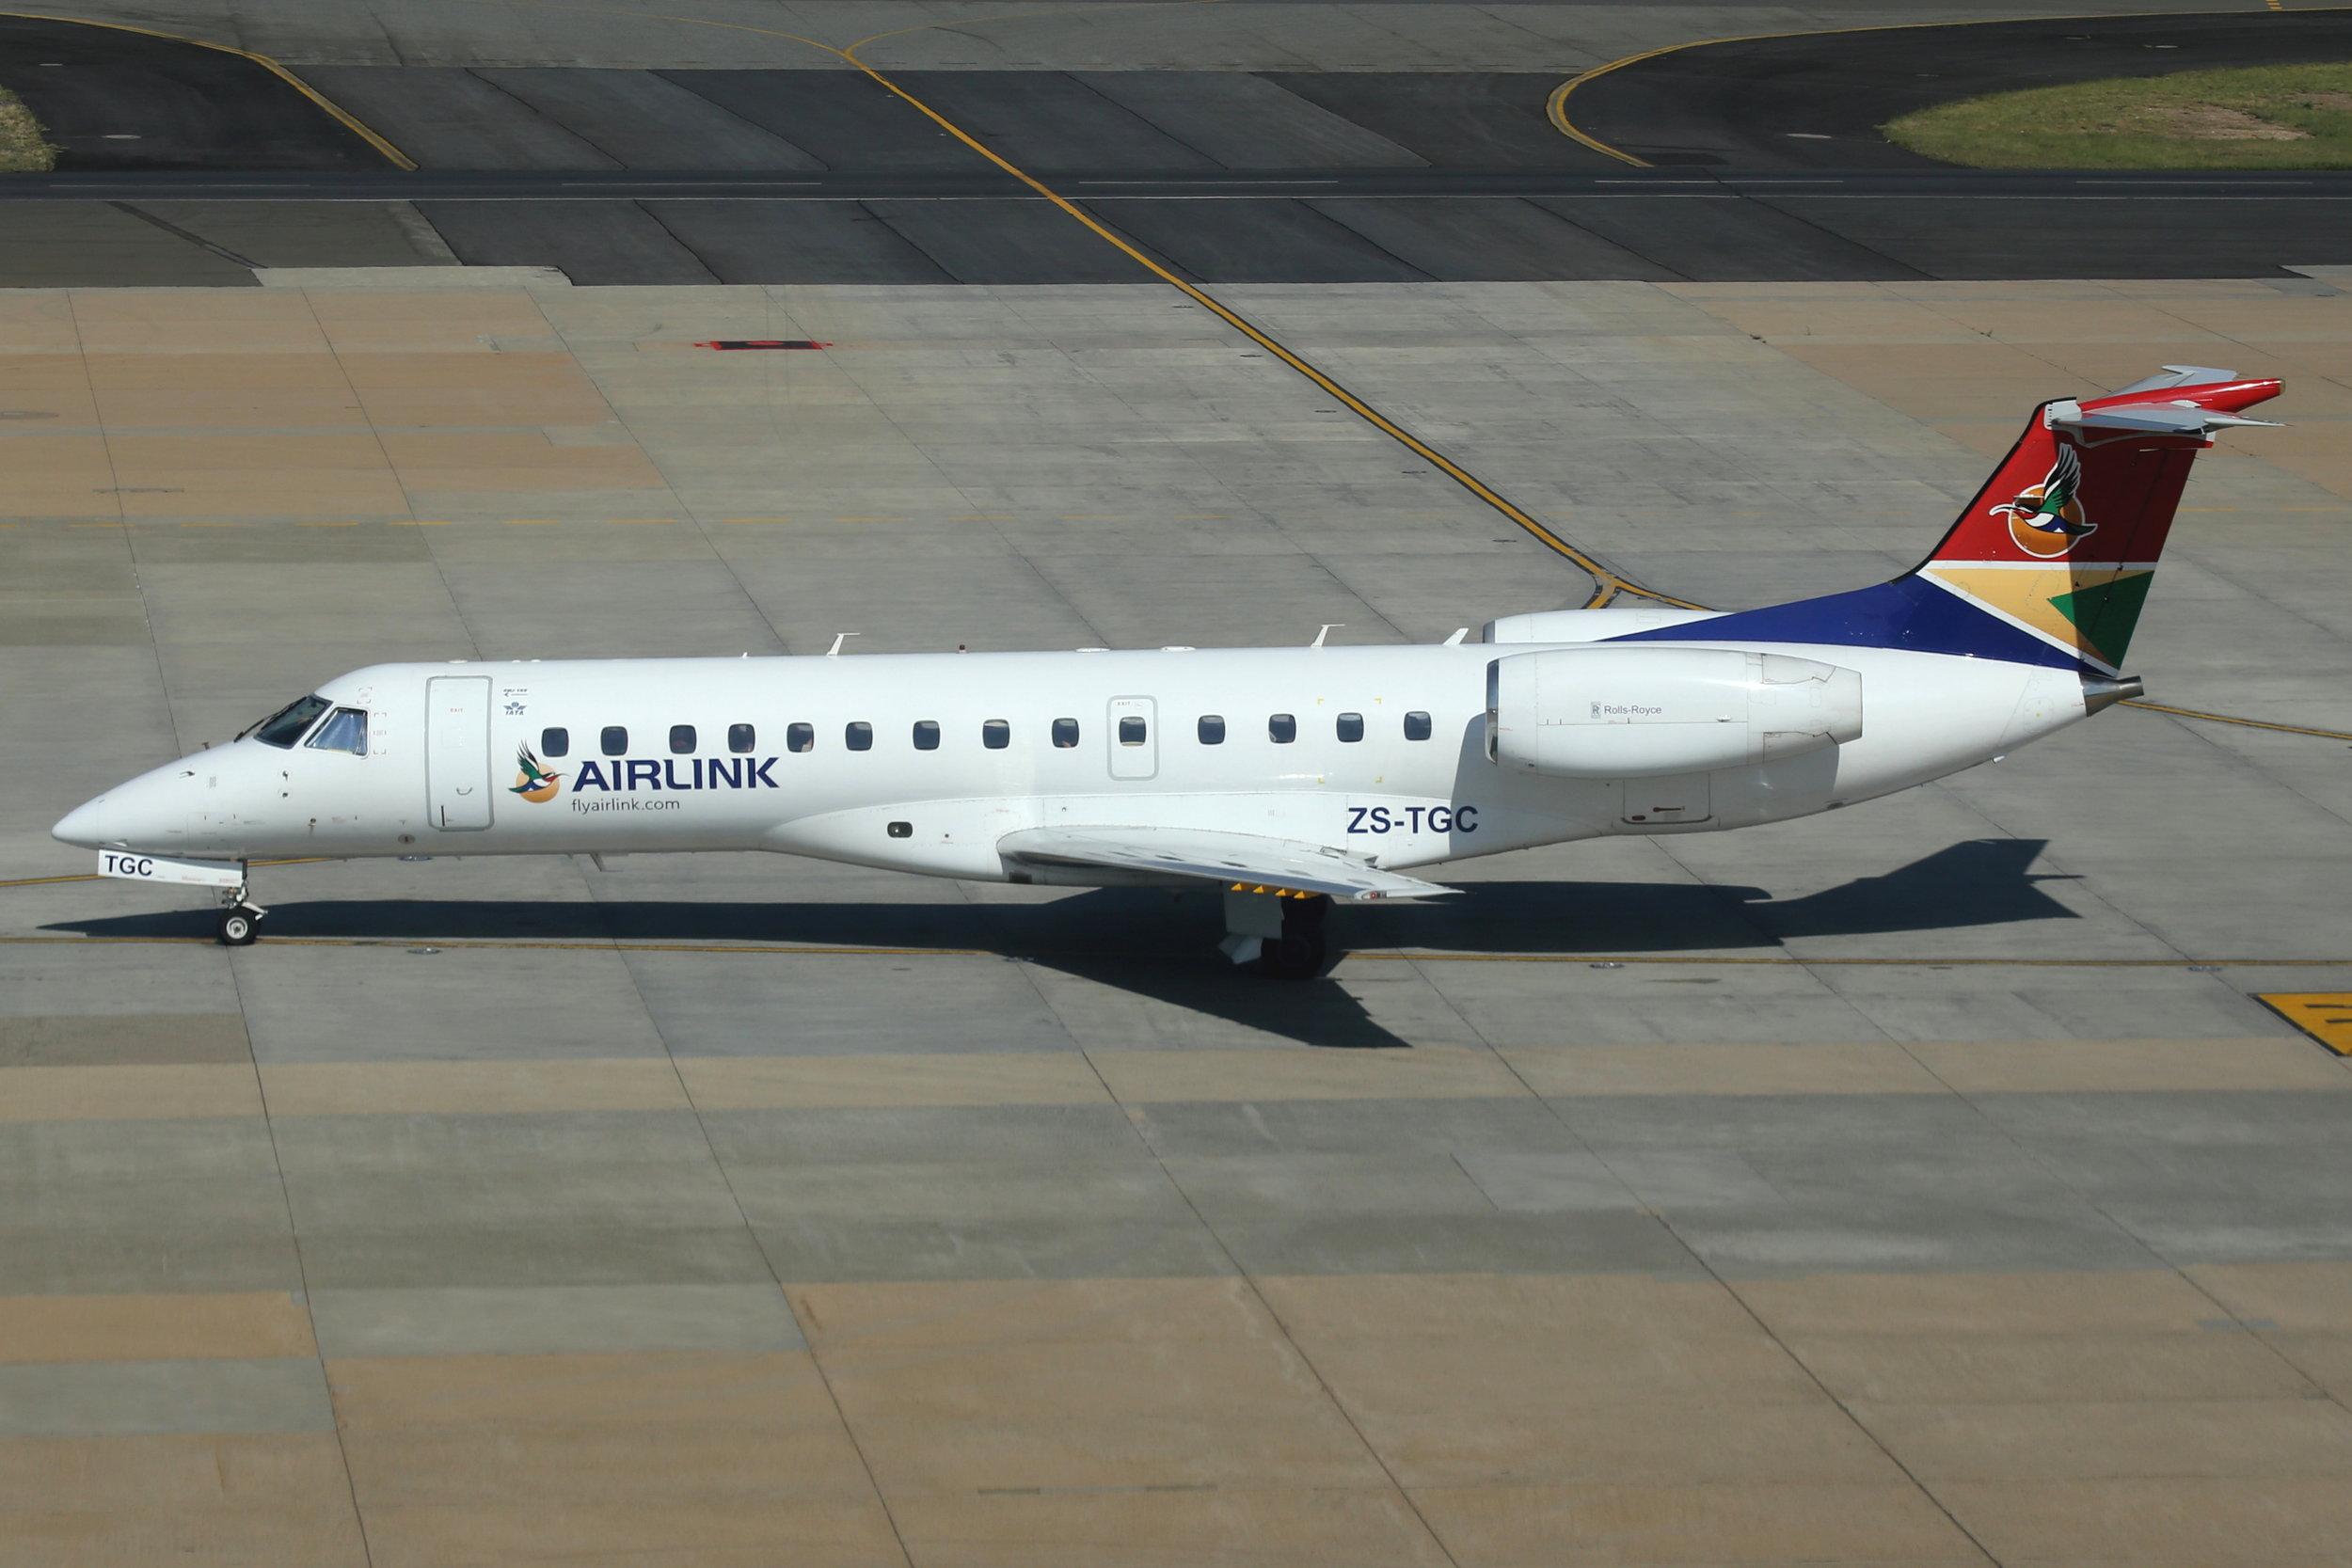 ZS-TGC SAA Airlink Embraer 135 taken at Johannesburg 11th November 2018 by John Wood